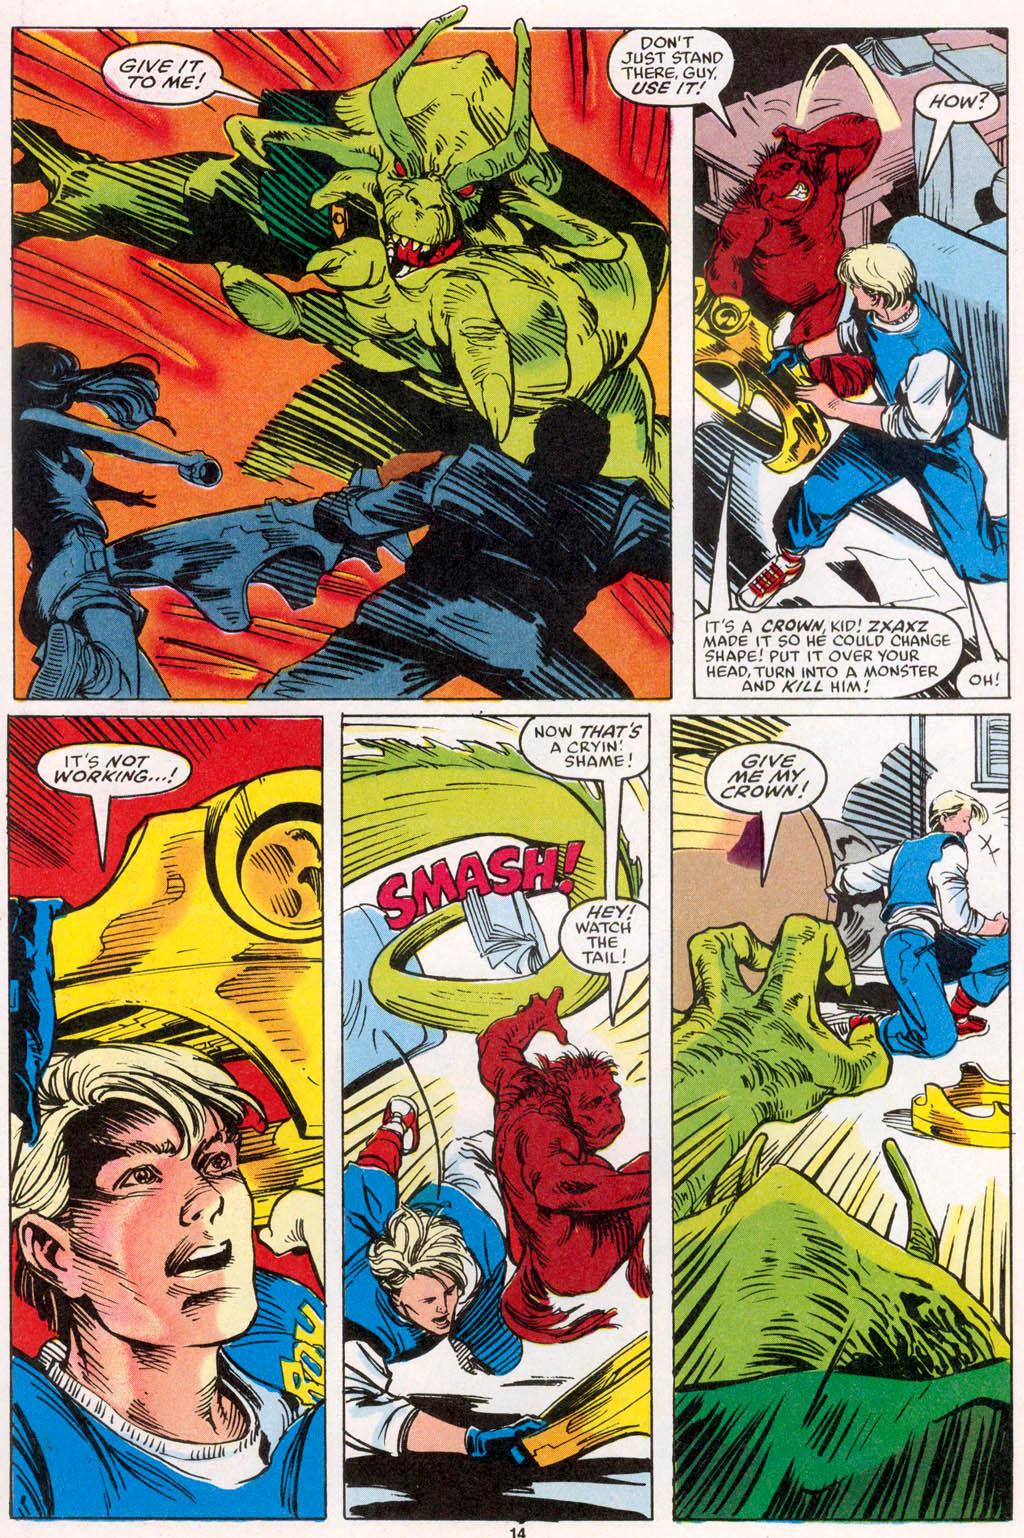 Read online Spellbound comic -  Issue #1 - 15